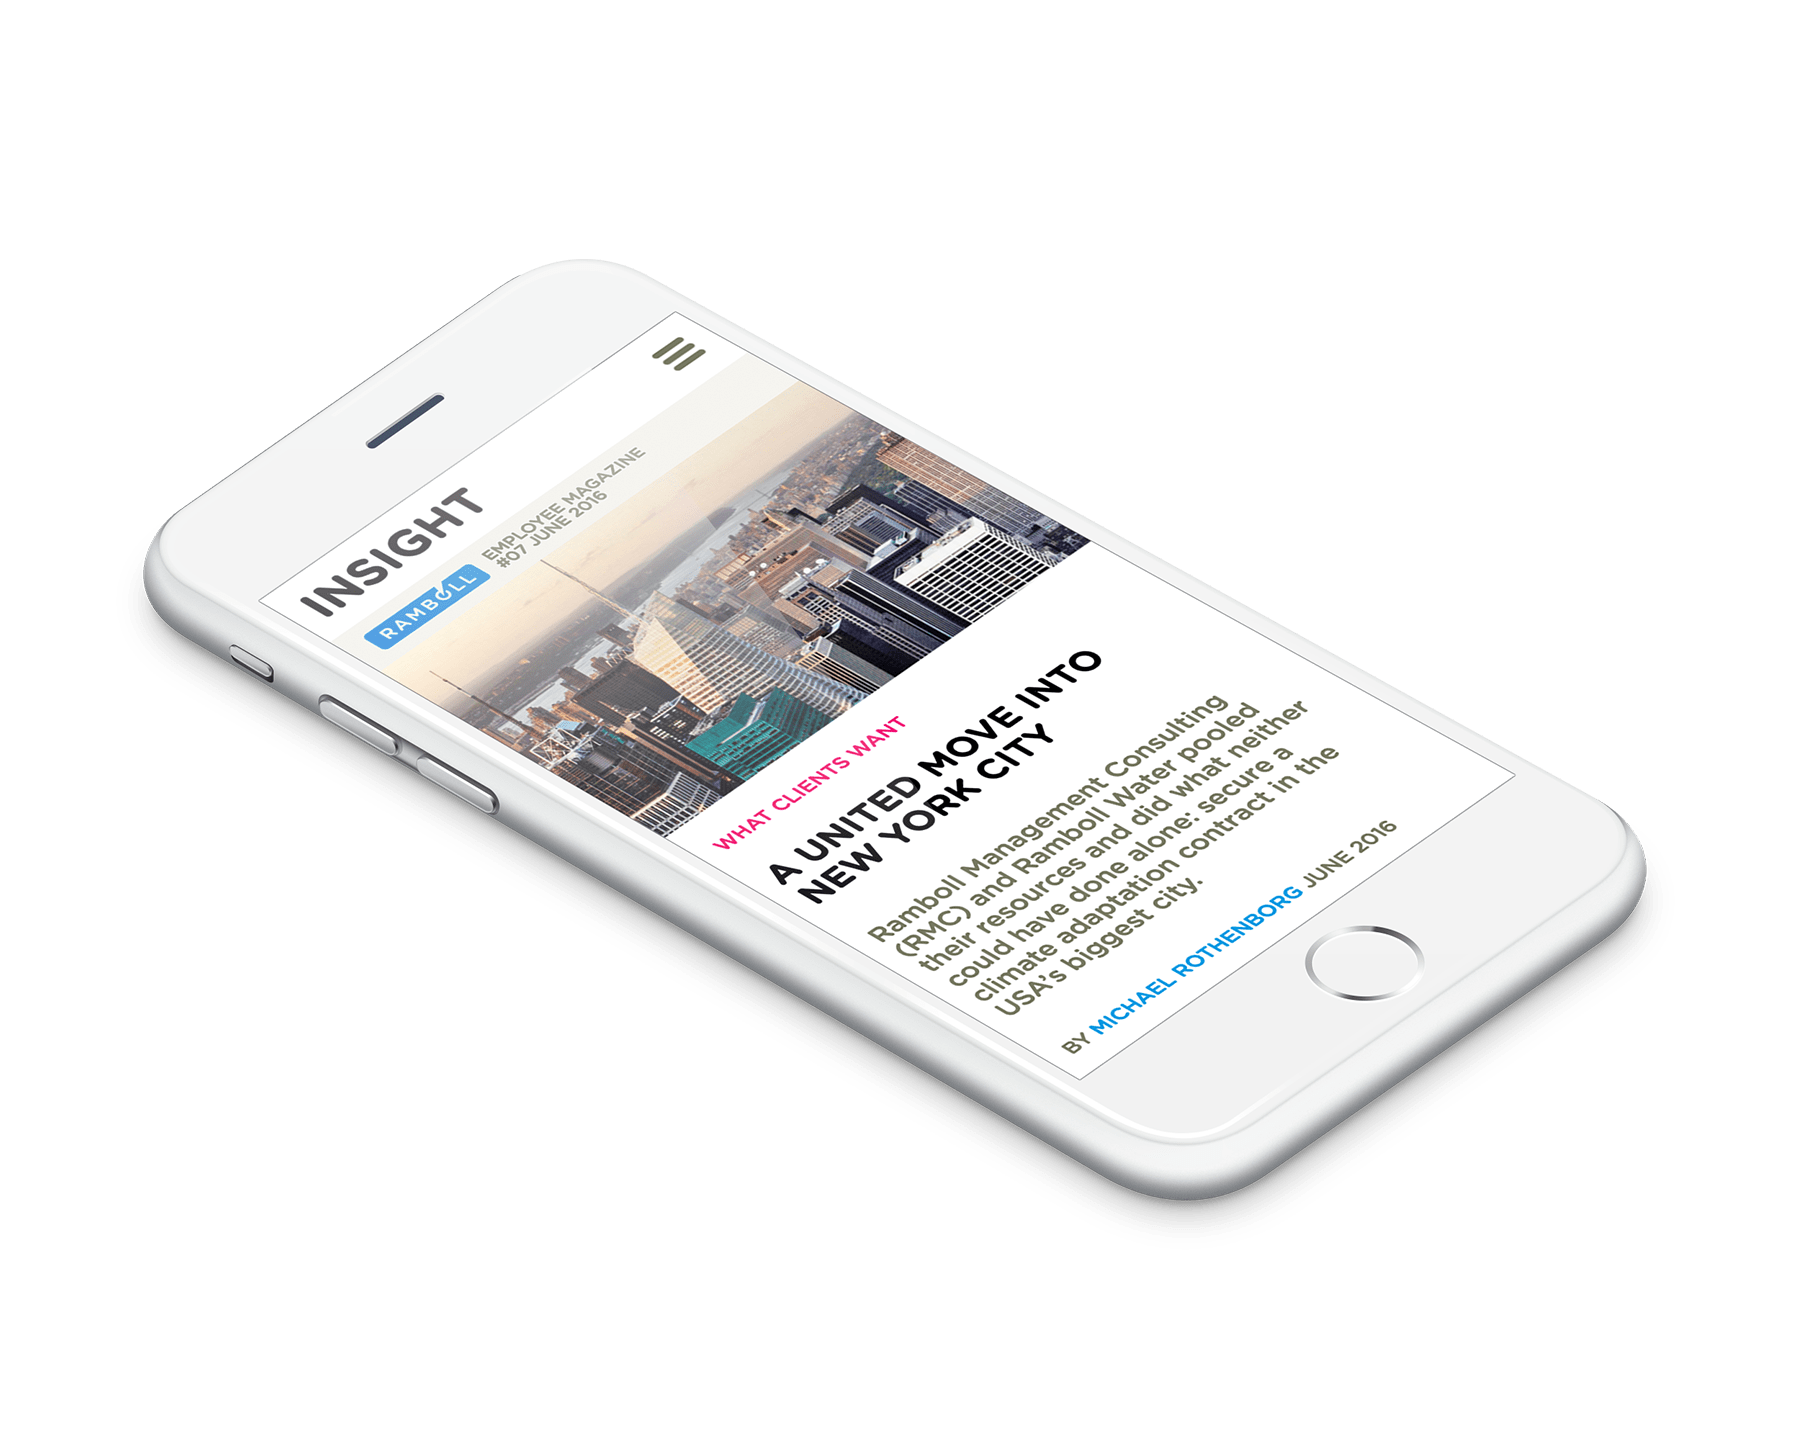 Insight - Ramboll employee magazine